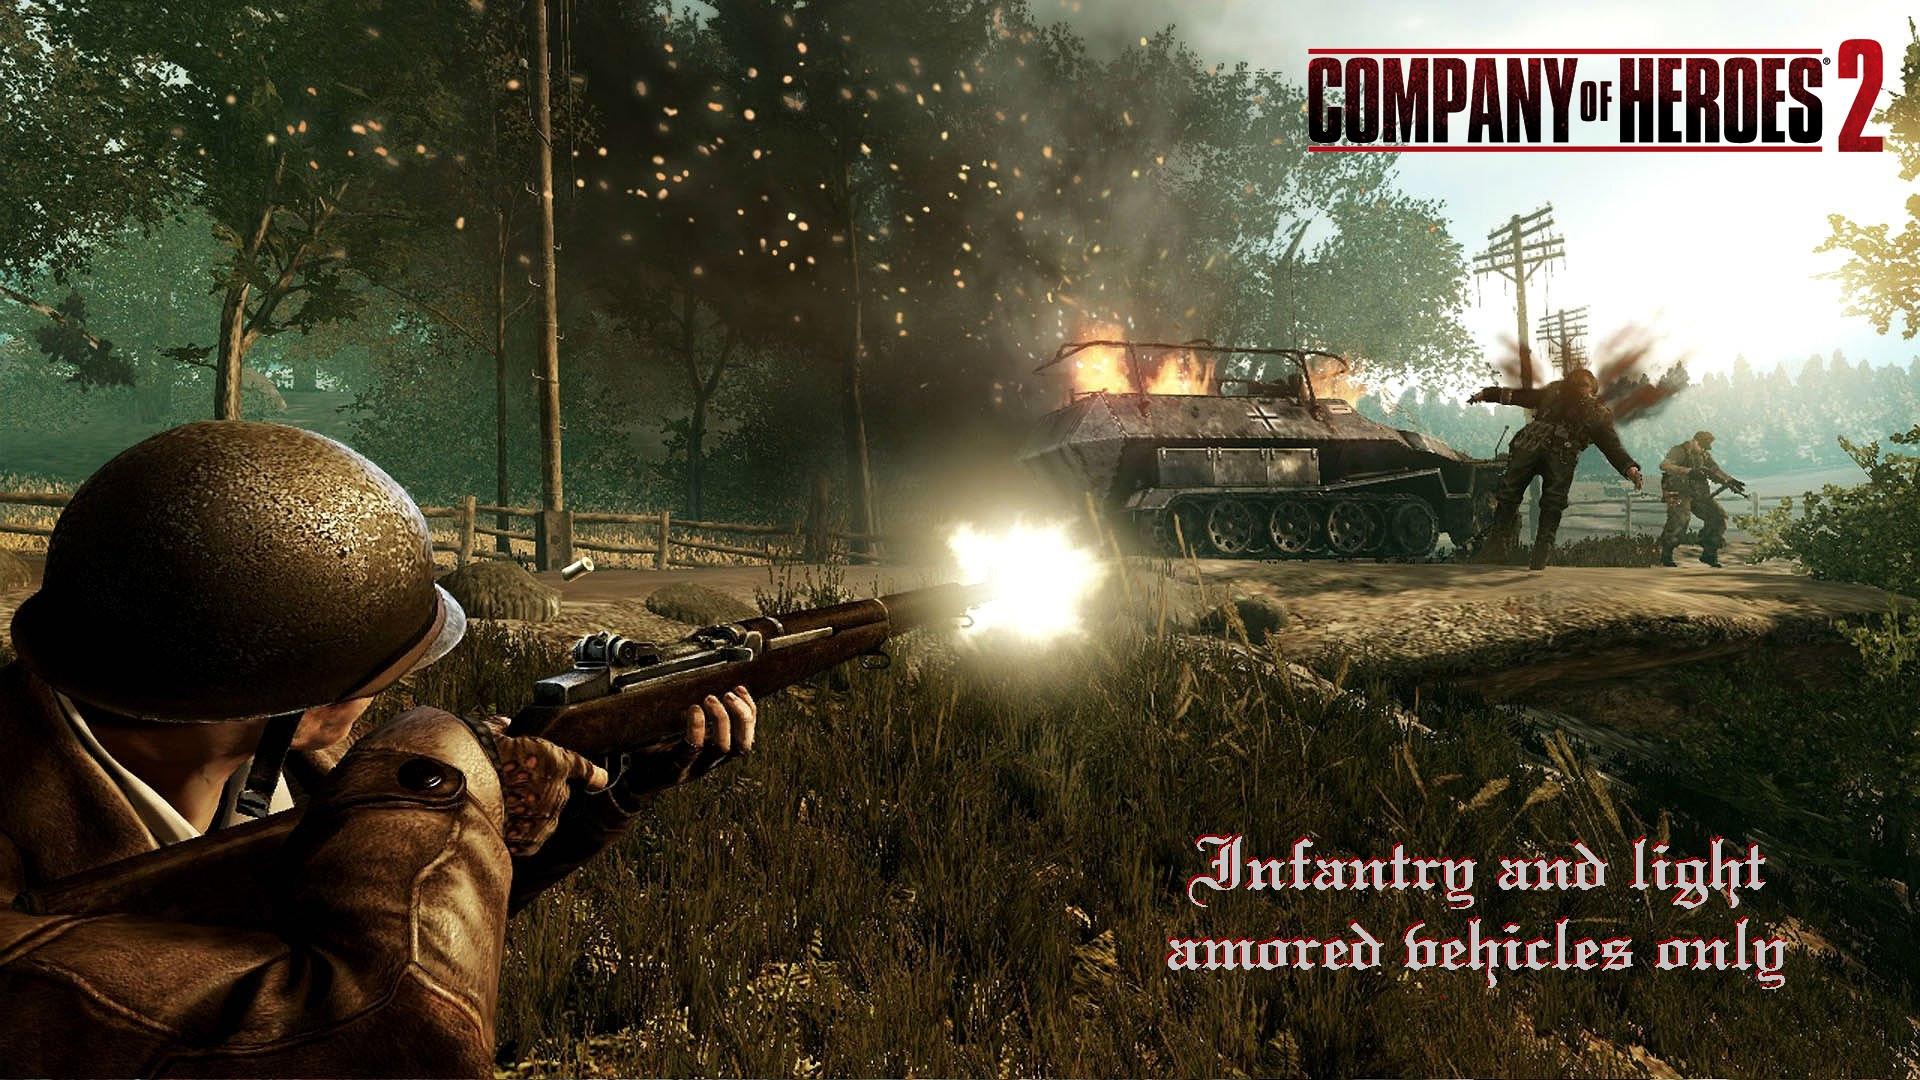 Infantry & Light Amored Vehicles